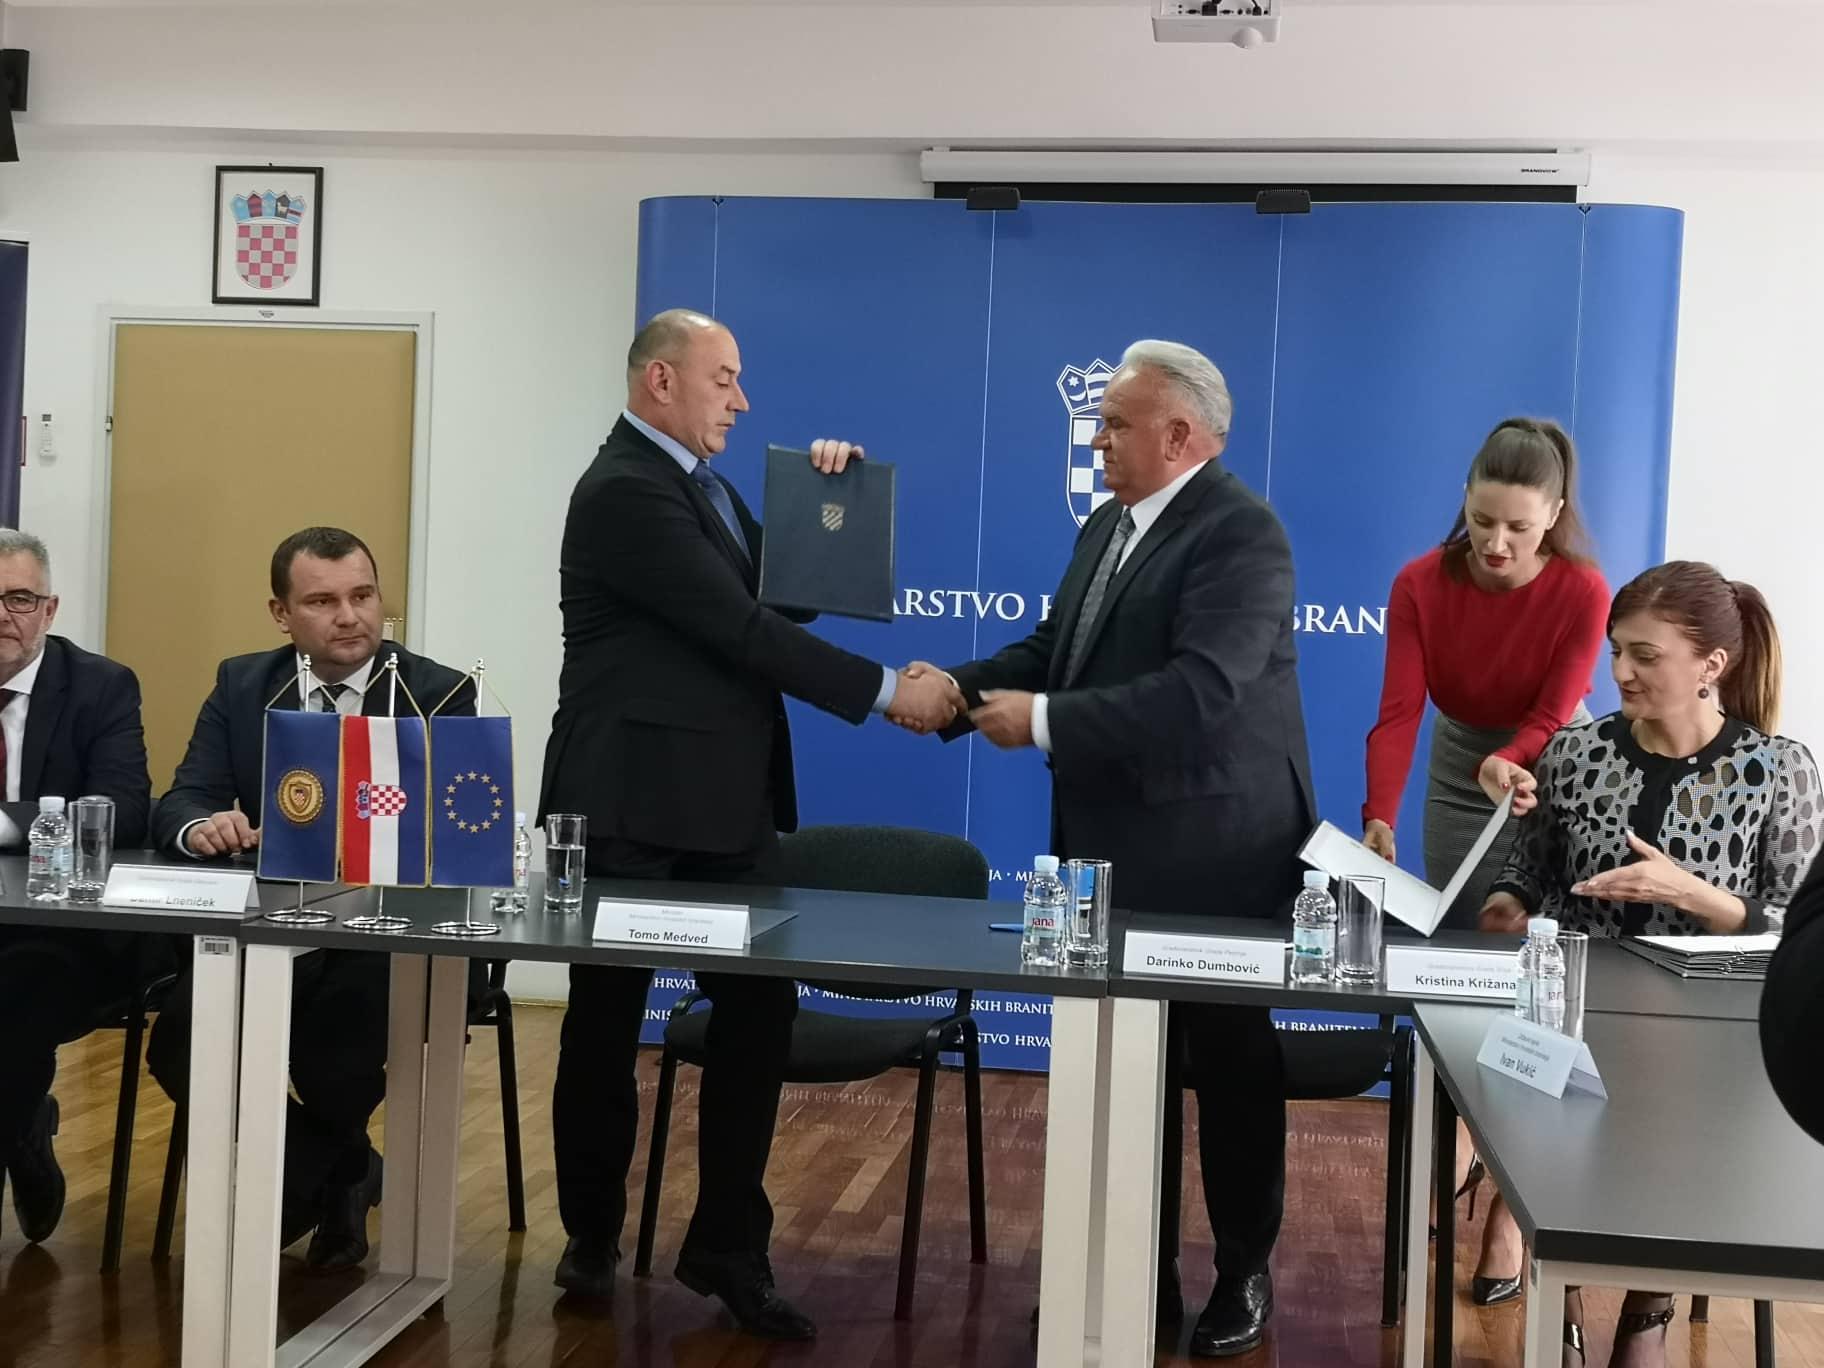 Potpisan sporazum o suradnji pri radu Veteranskog centra u Petrinji